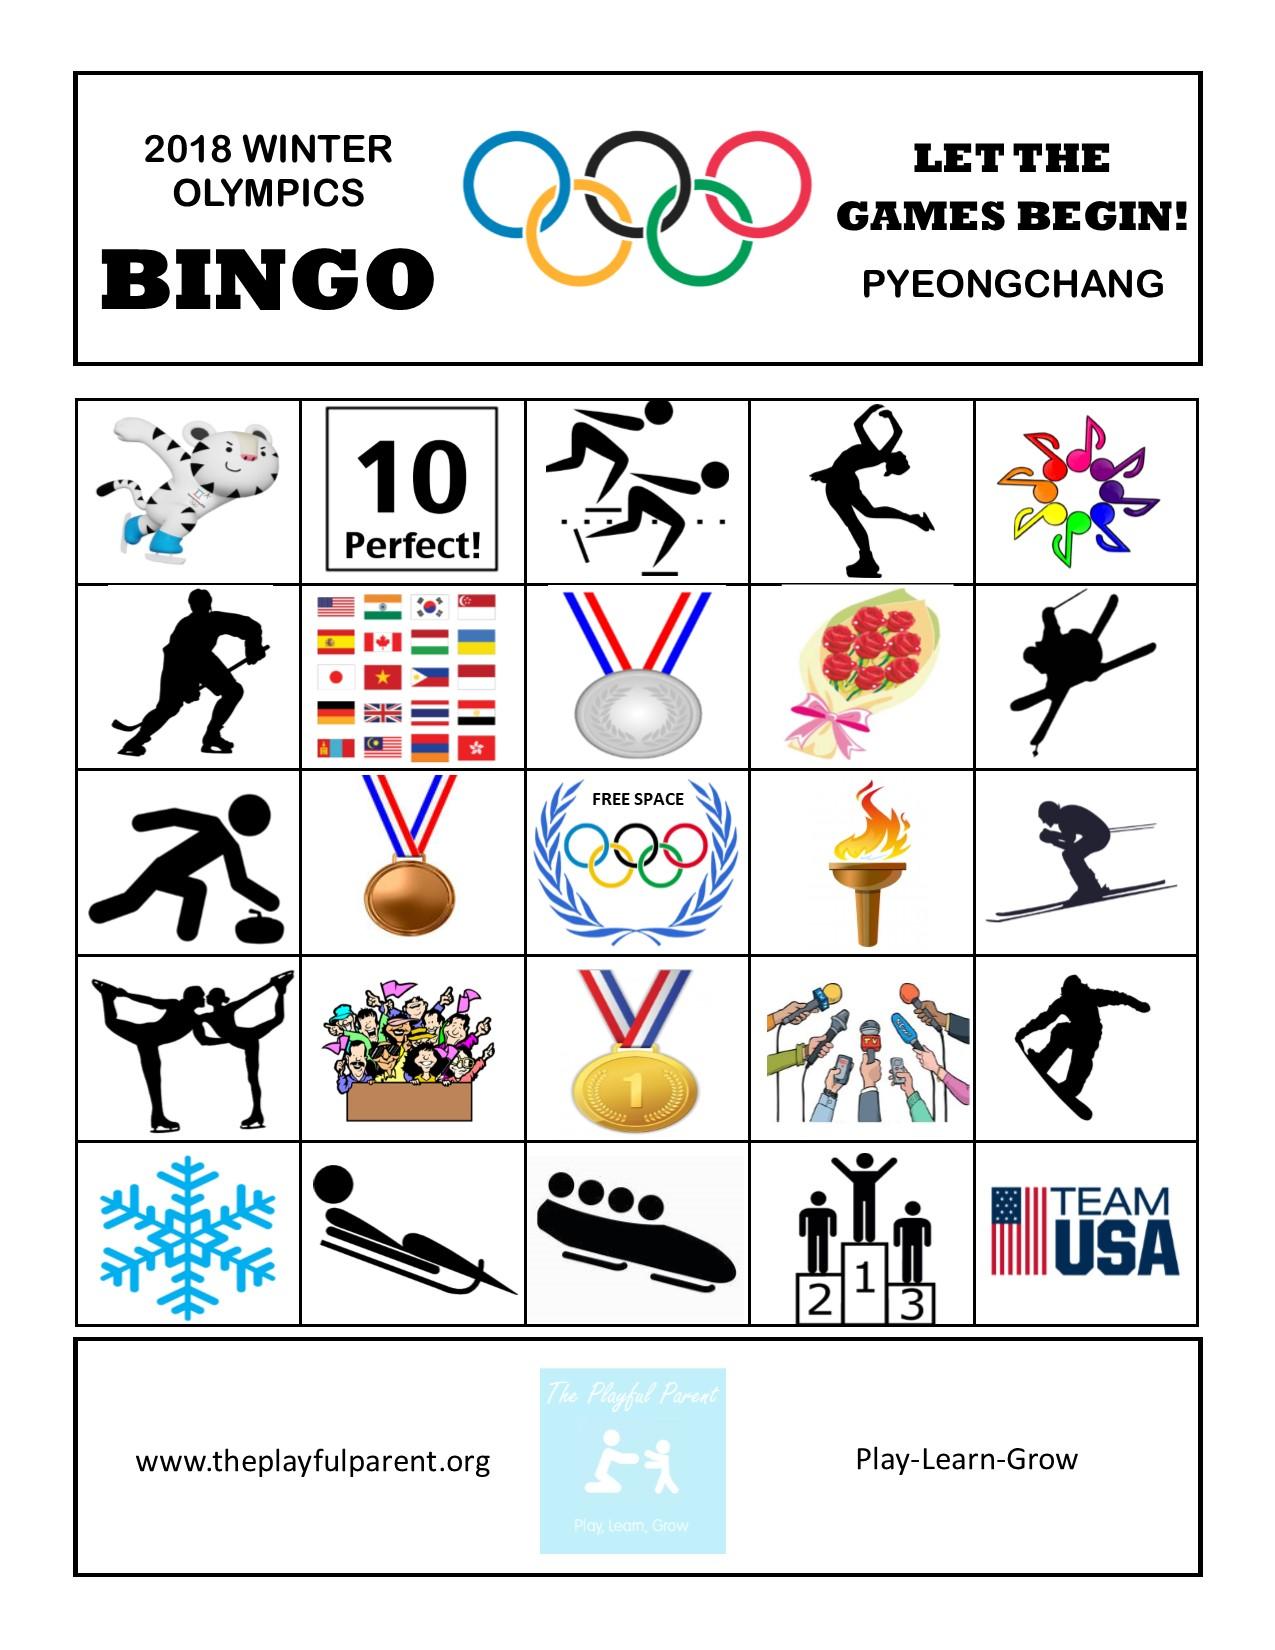 graphic about Winter Bingo Cards Free Printable named Totally free PRINTABLE Winter season OLYMPIC BINGO